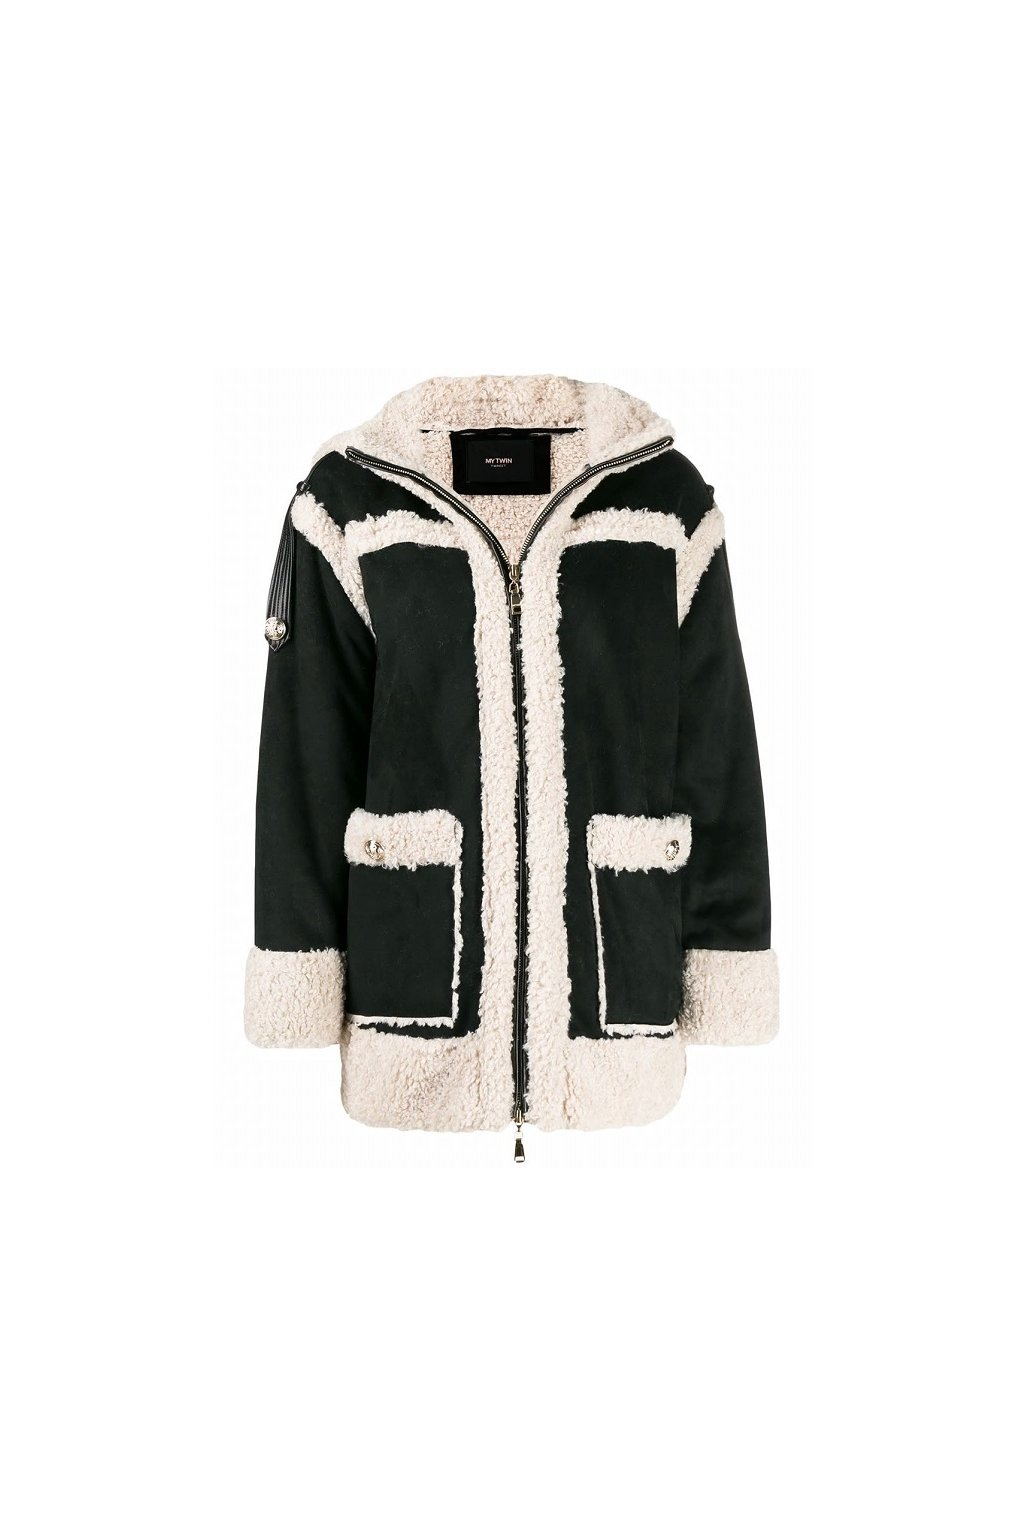 192MT2021 Dámský Twinset kabát černý